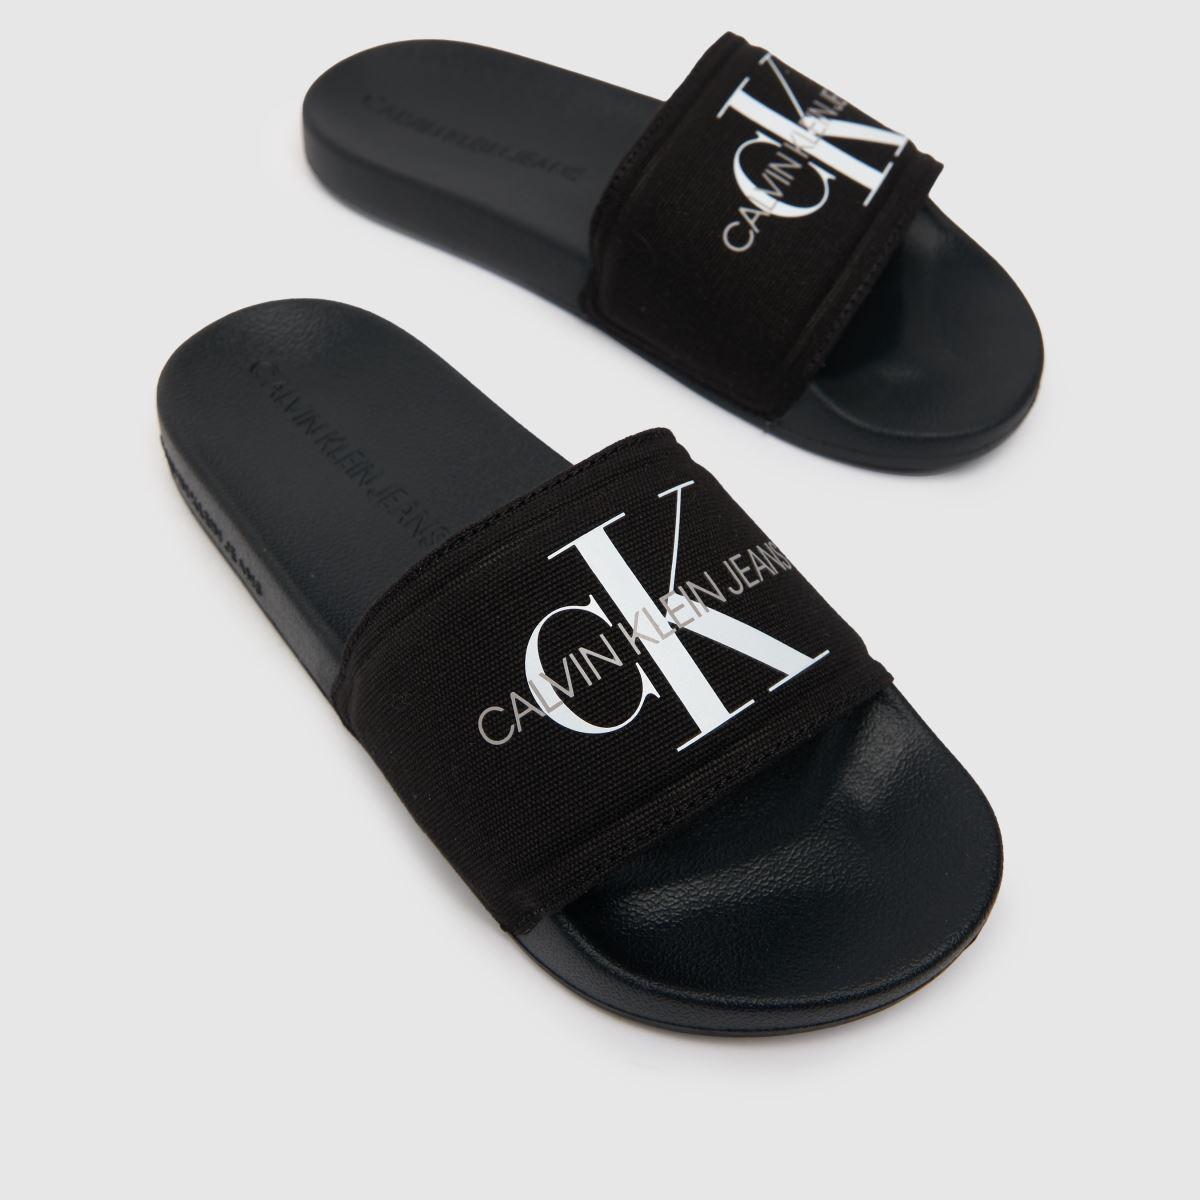 Damen Schwarz-weiß calvin Canvas klein Jeans Chantal Heavy Canvas calvin Sandalen | schuh Gute Qualität beliebte Schuhe fa0d52